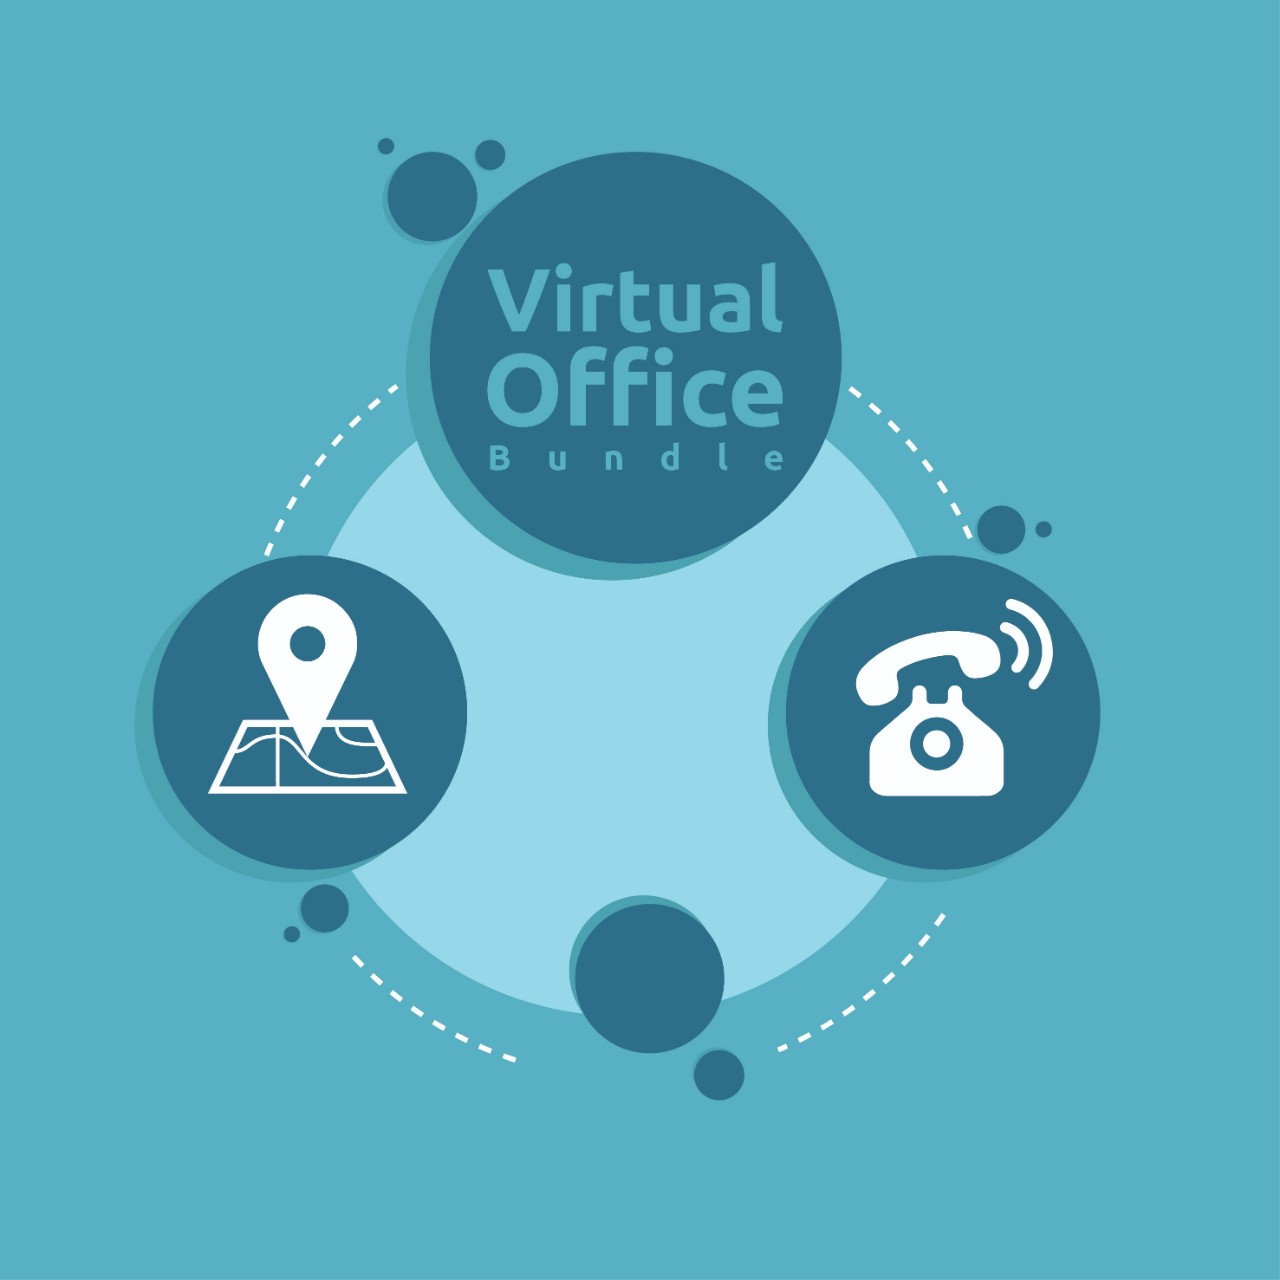 Virtual Office Bundle